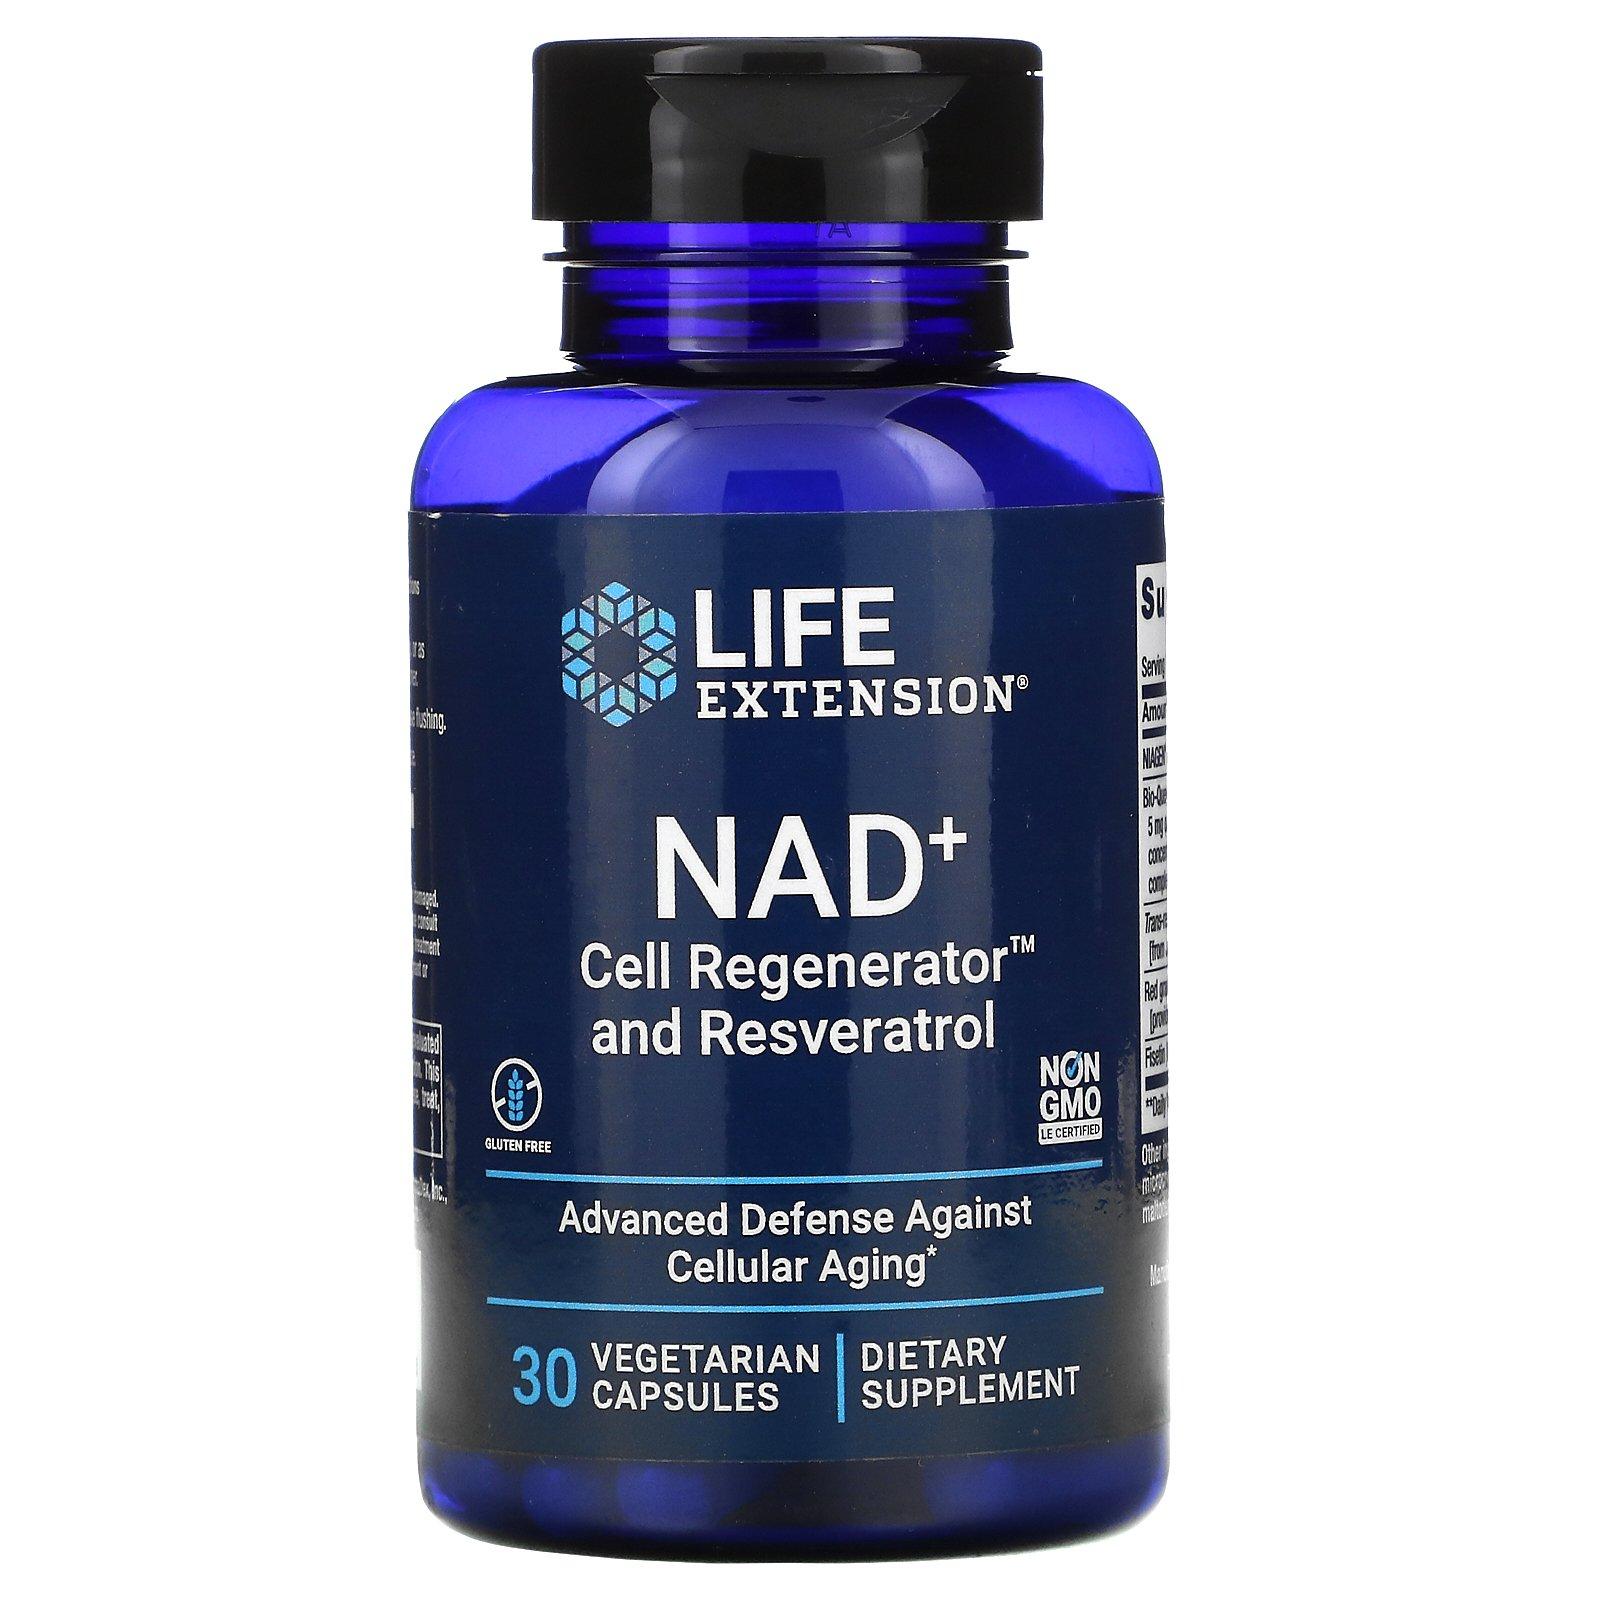 Life Extension, NAD+ Cell Regenerator and Resveratrol, 30 Vegetarian Capsules